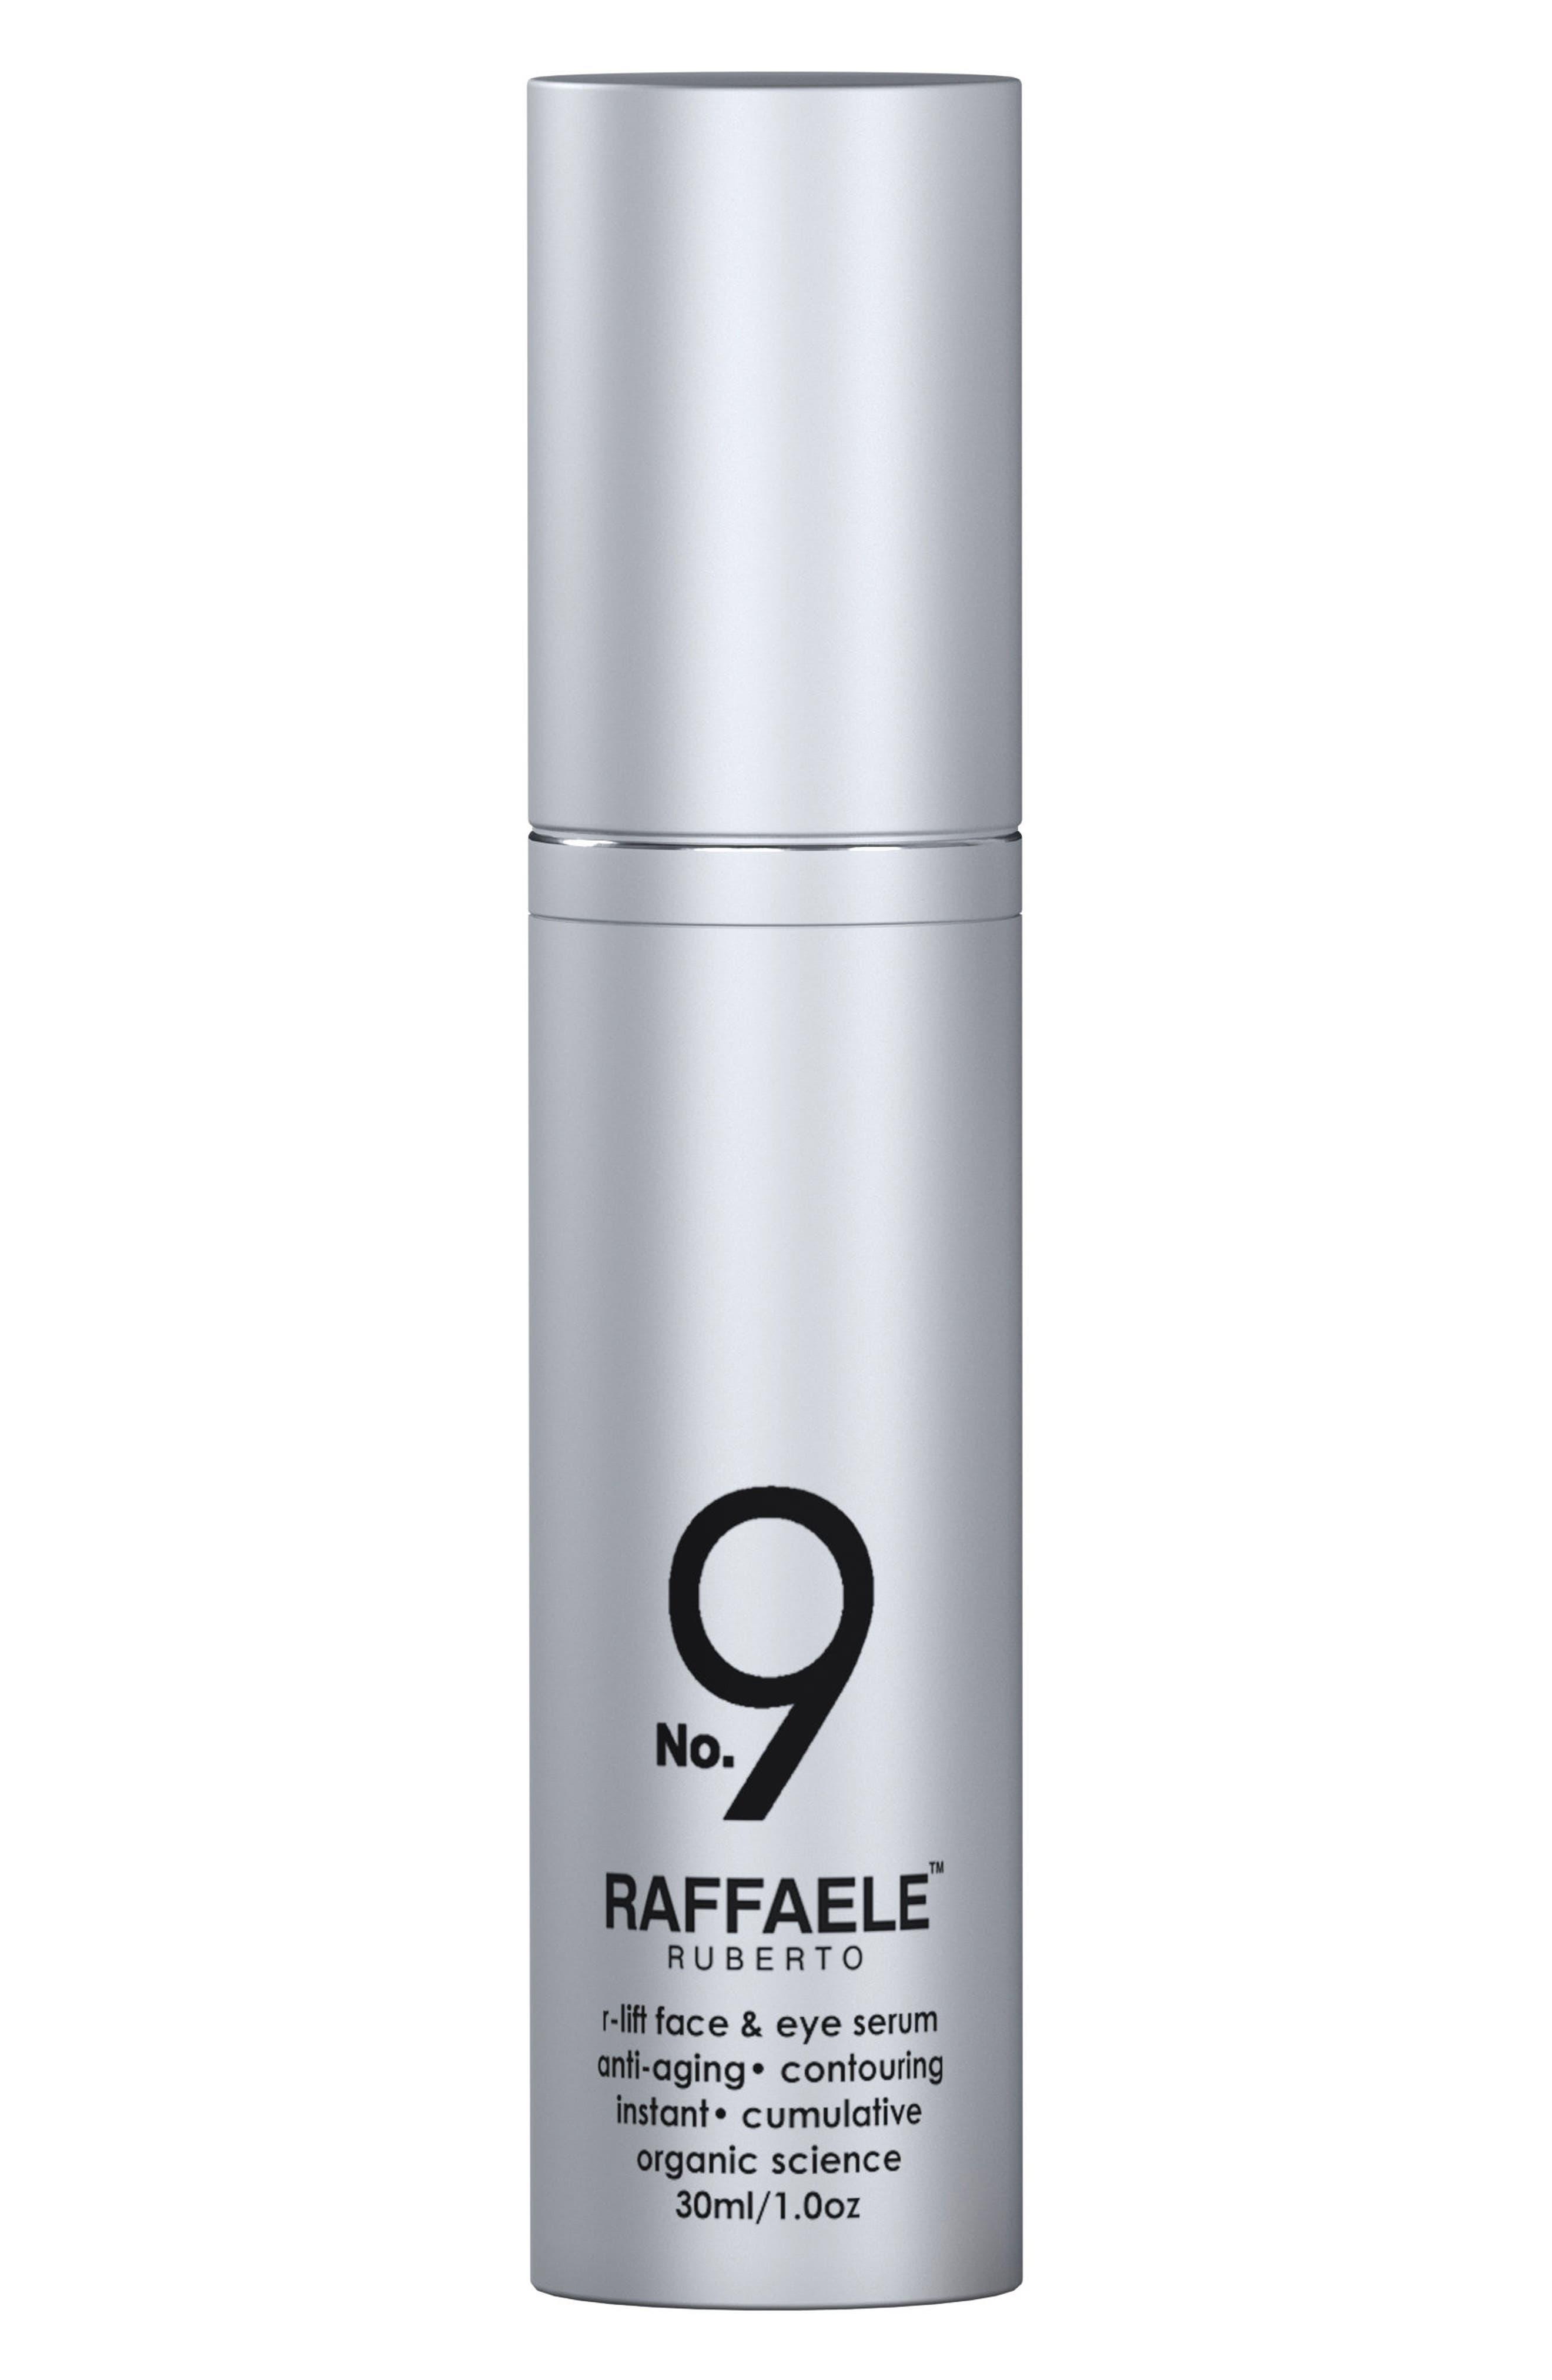 RAFFAELE RUBERTO® SKIN Formula No. 9 R-lift Face